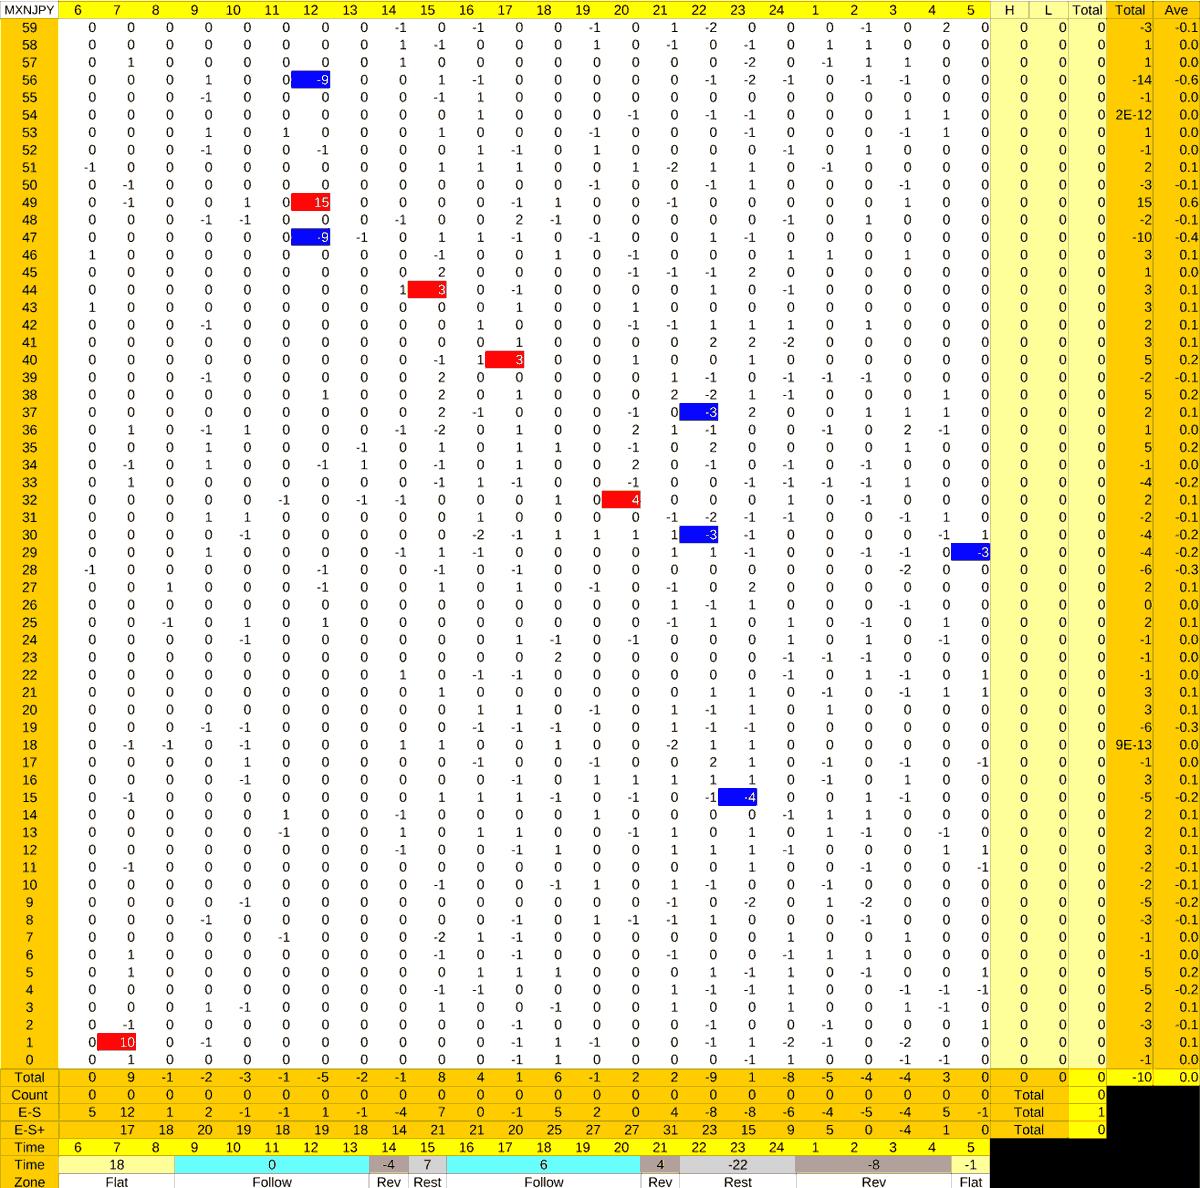 20210813_HS(3)MXNJPY